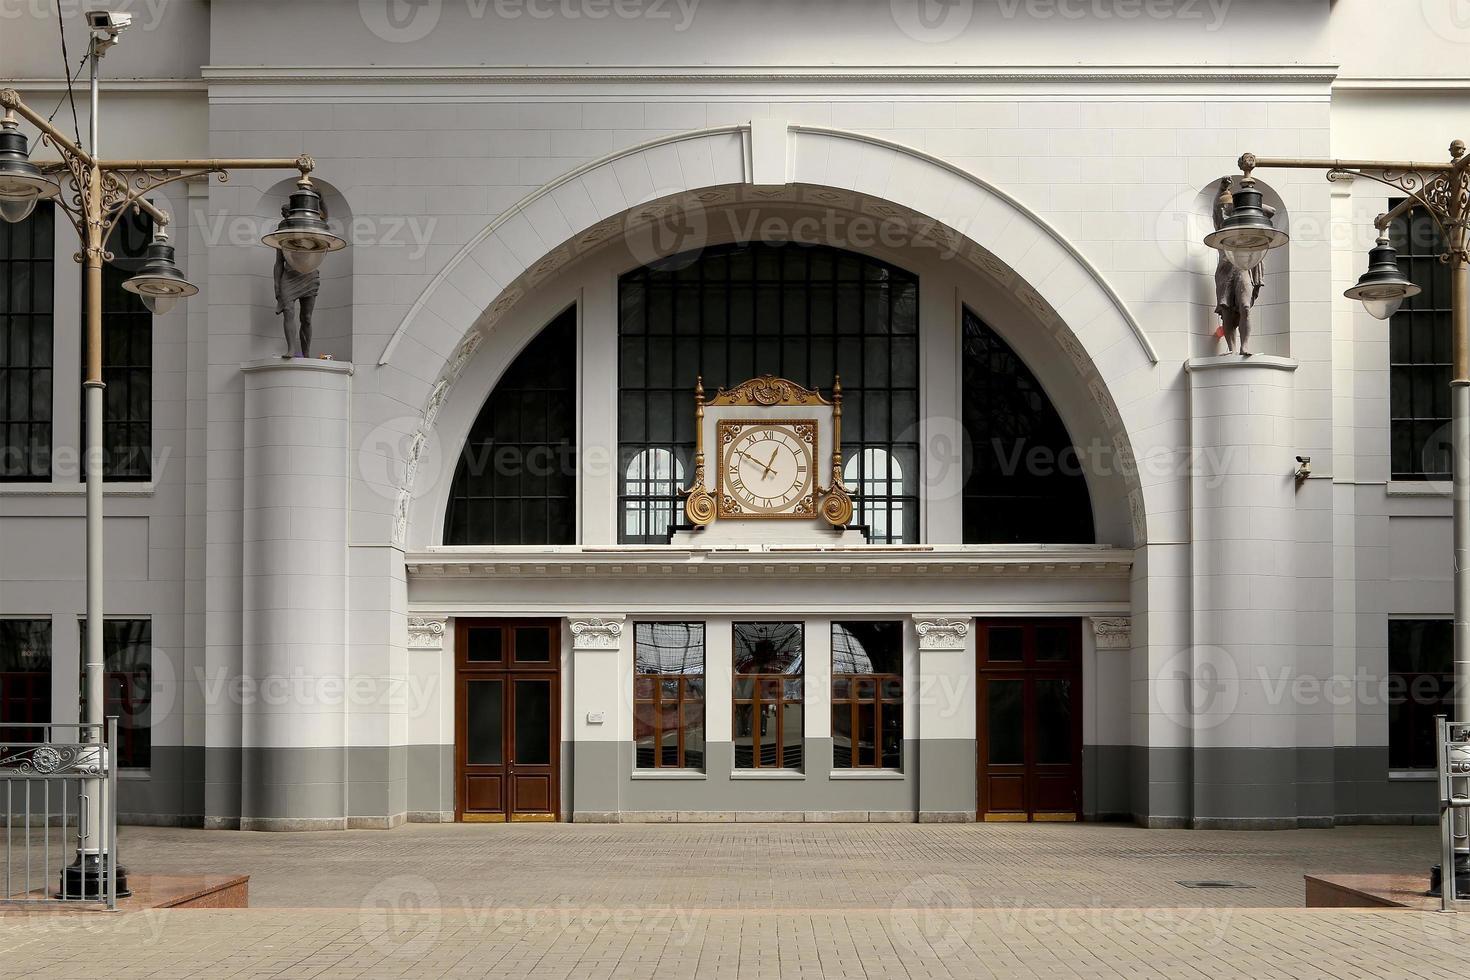 Kiyevskaya railway station of Moscow, Russia photo